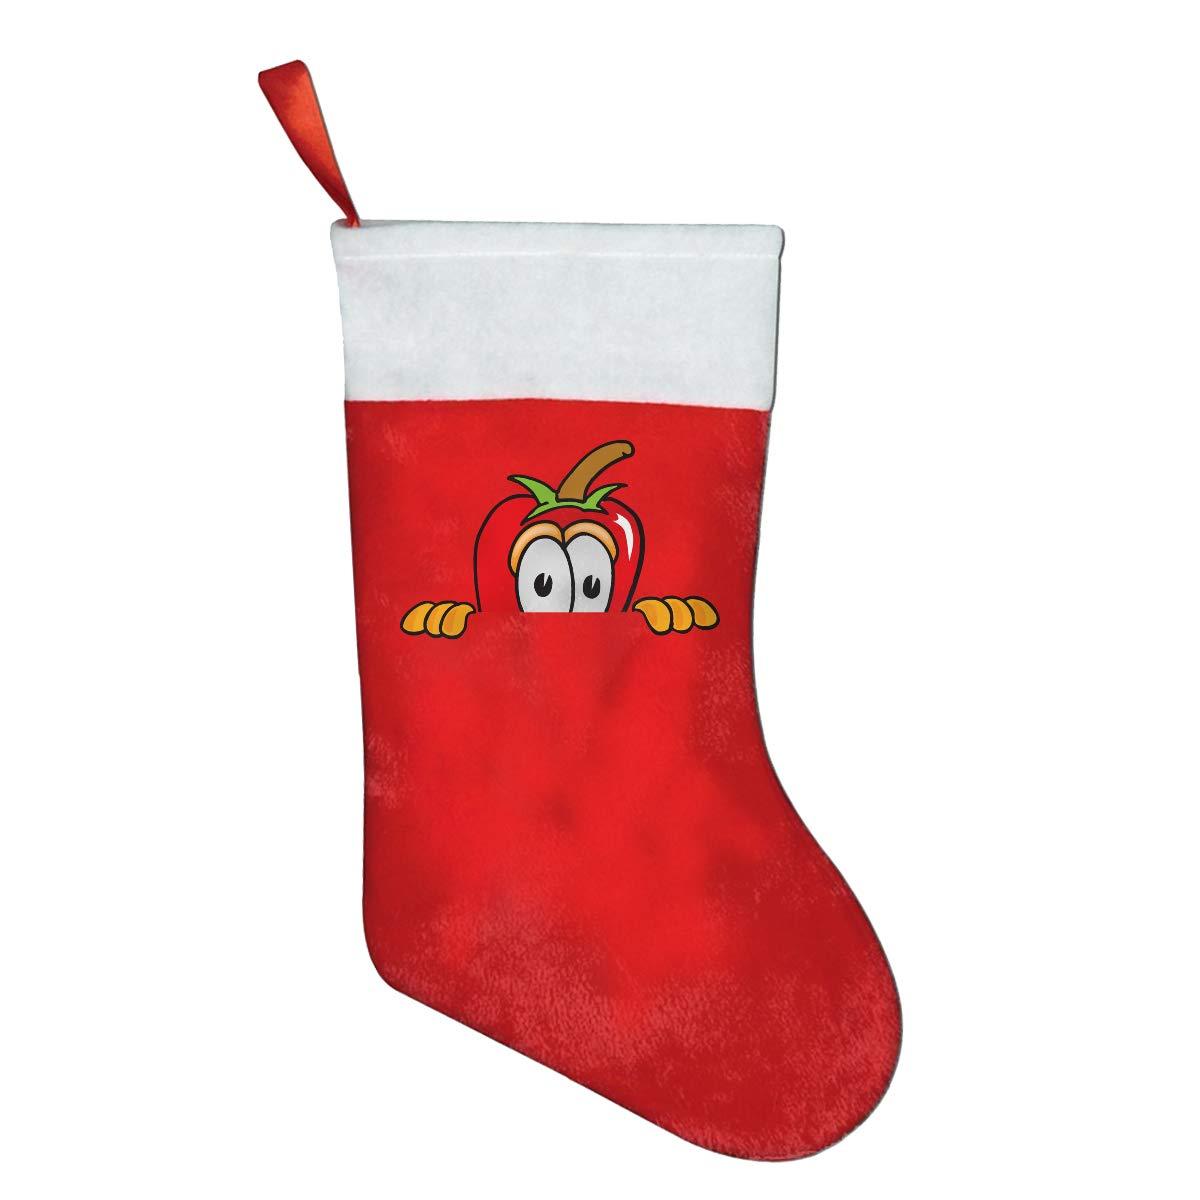 Amazon.com: YyTiin Chili Pepper Cartoon Characters Clipart Christmas.